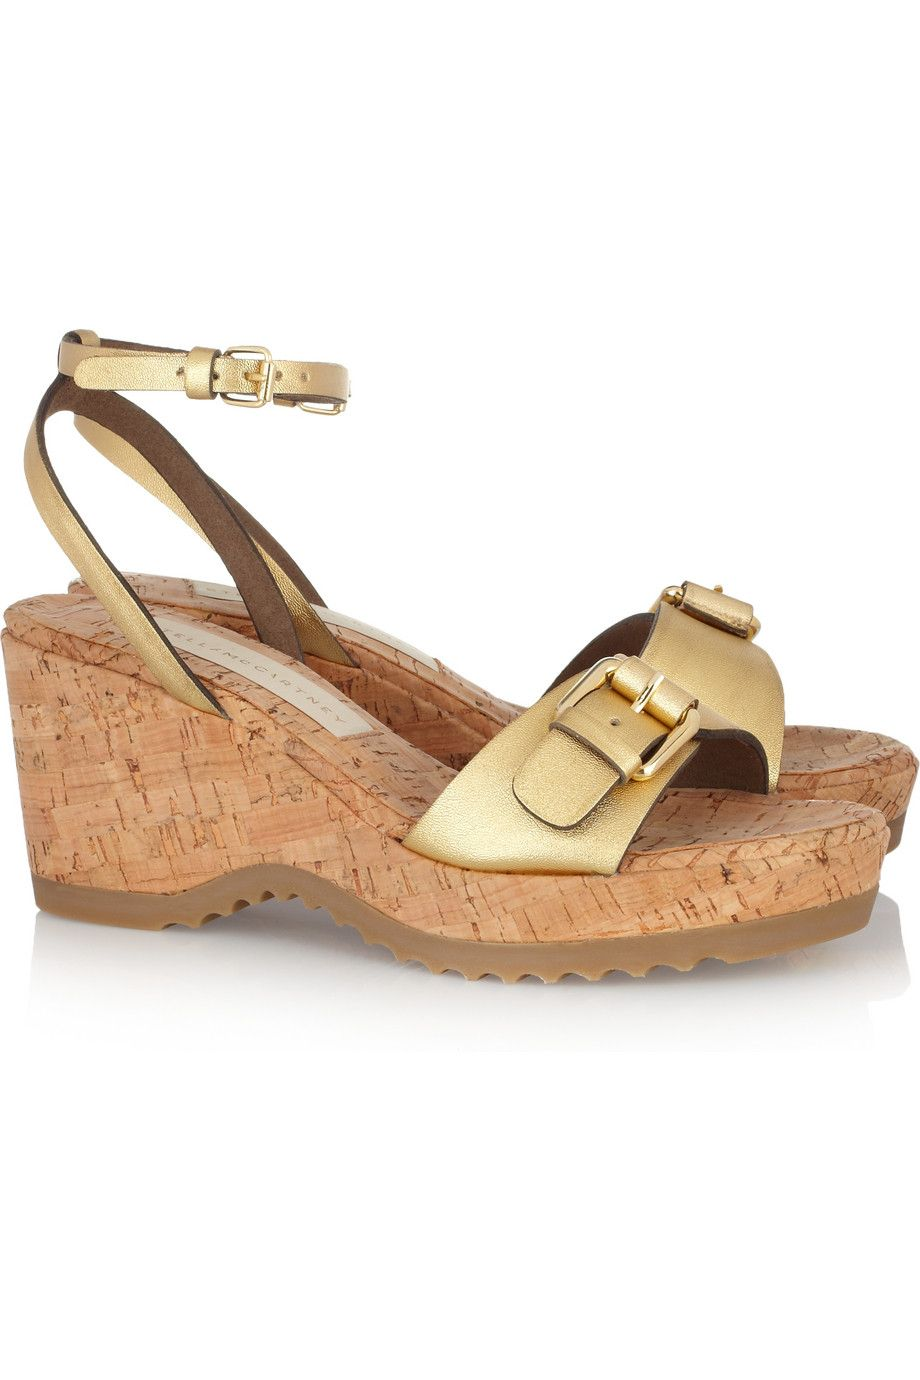 6e26a8b34 STELLA MCCARTNEY Metallic faux leather and cork wedge sandals